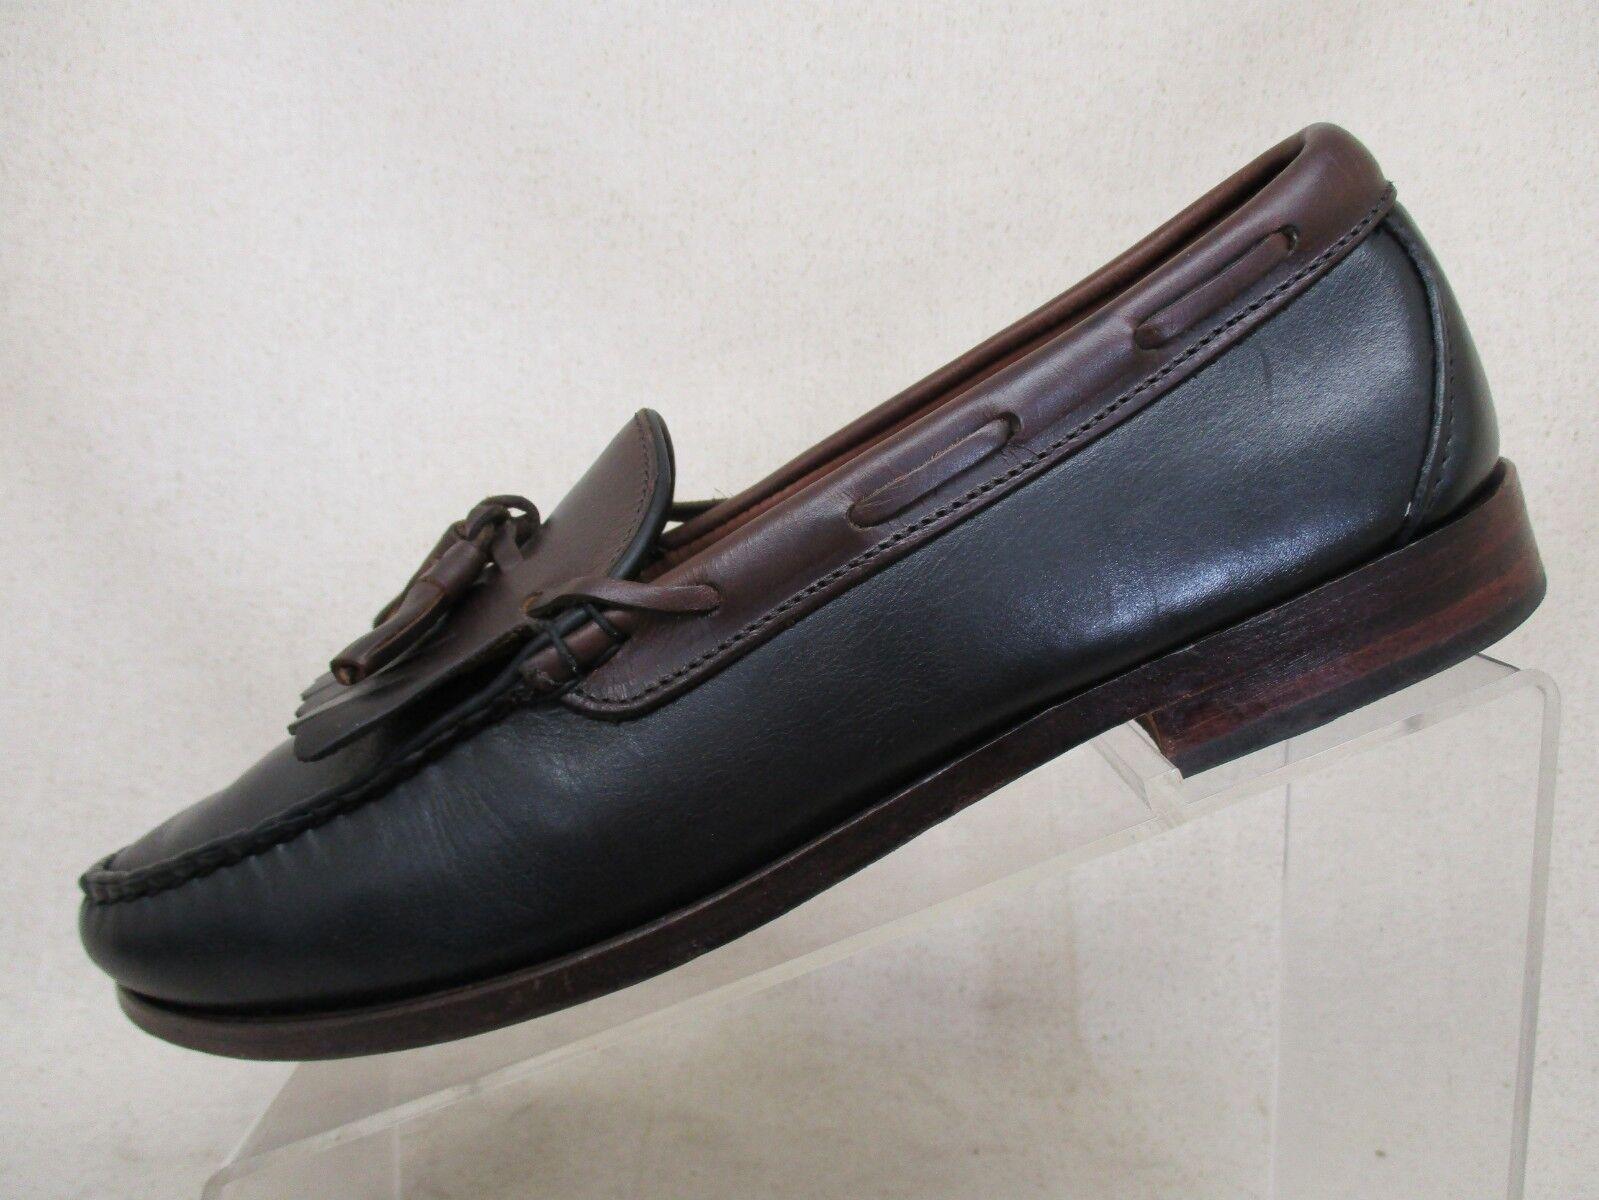 Allen Edmonds Kittery Black Brown Leather Moc Toe Tassel Loafers Size 9.5 D USA